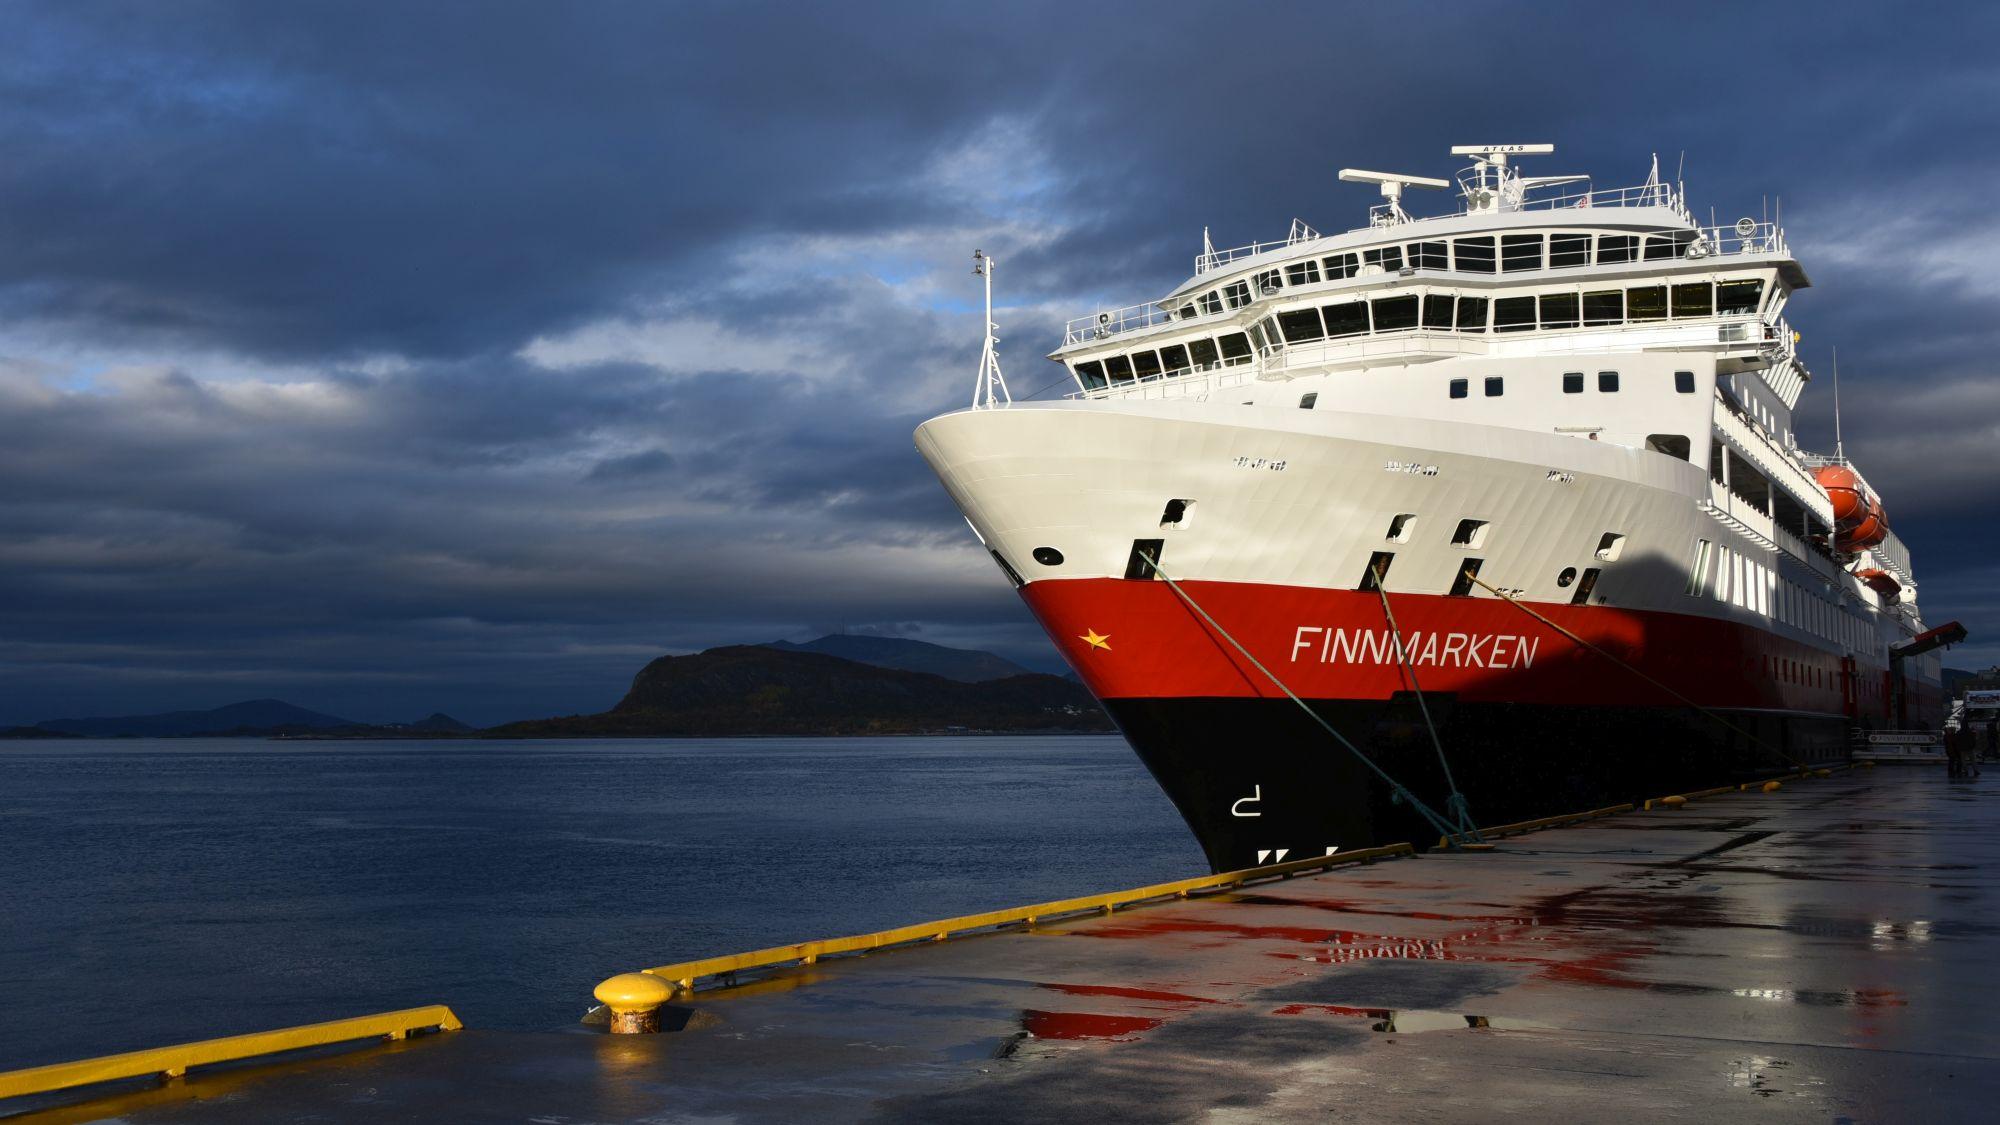 Hurtigrutenschiff Finnmarken